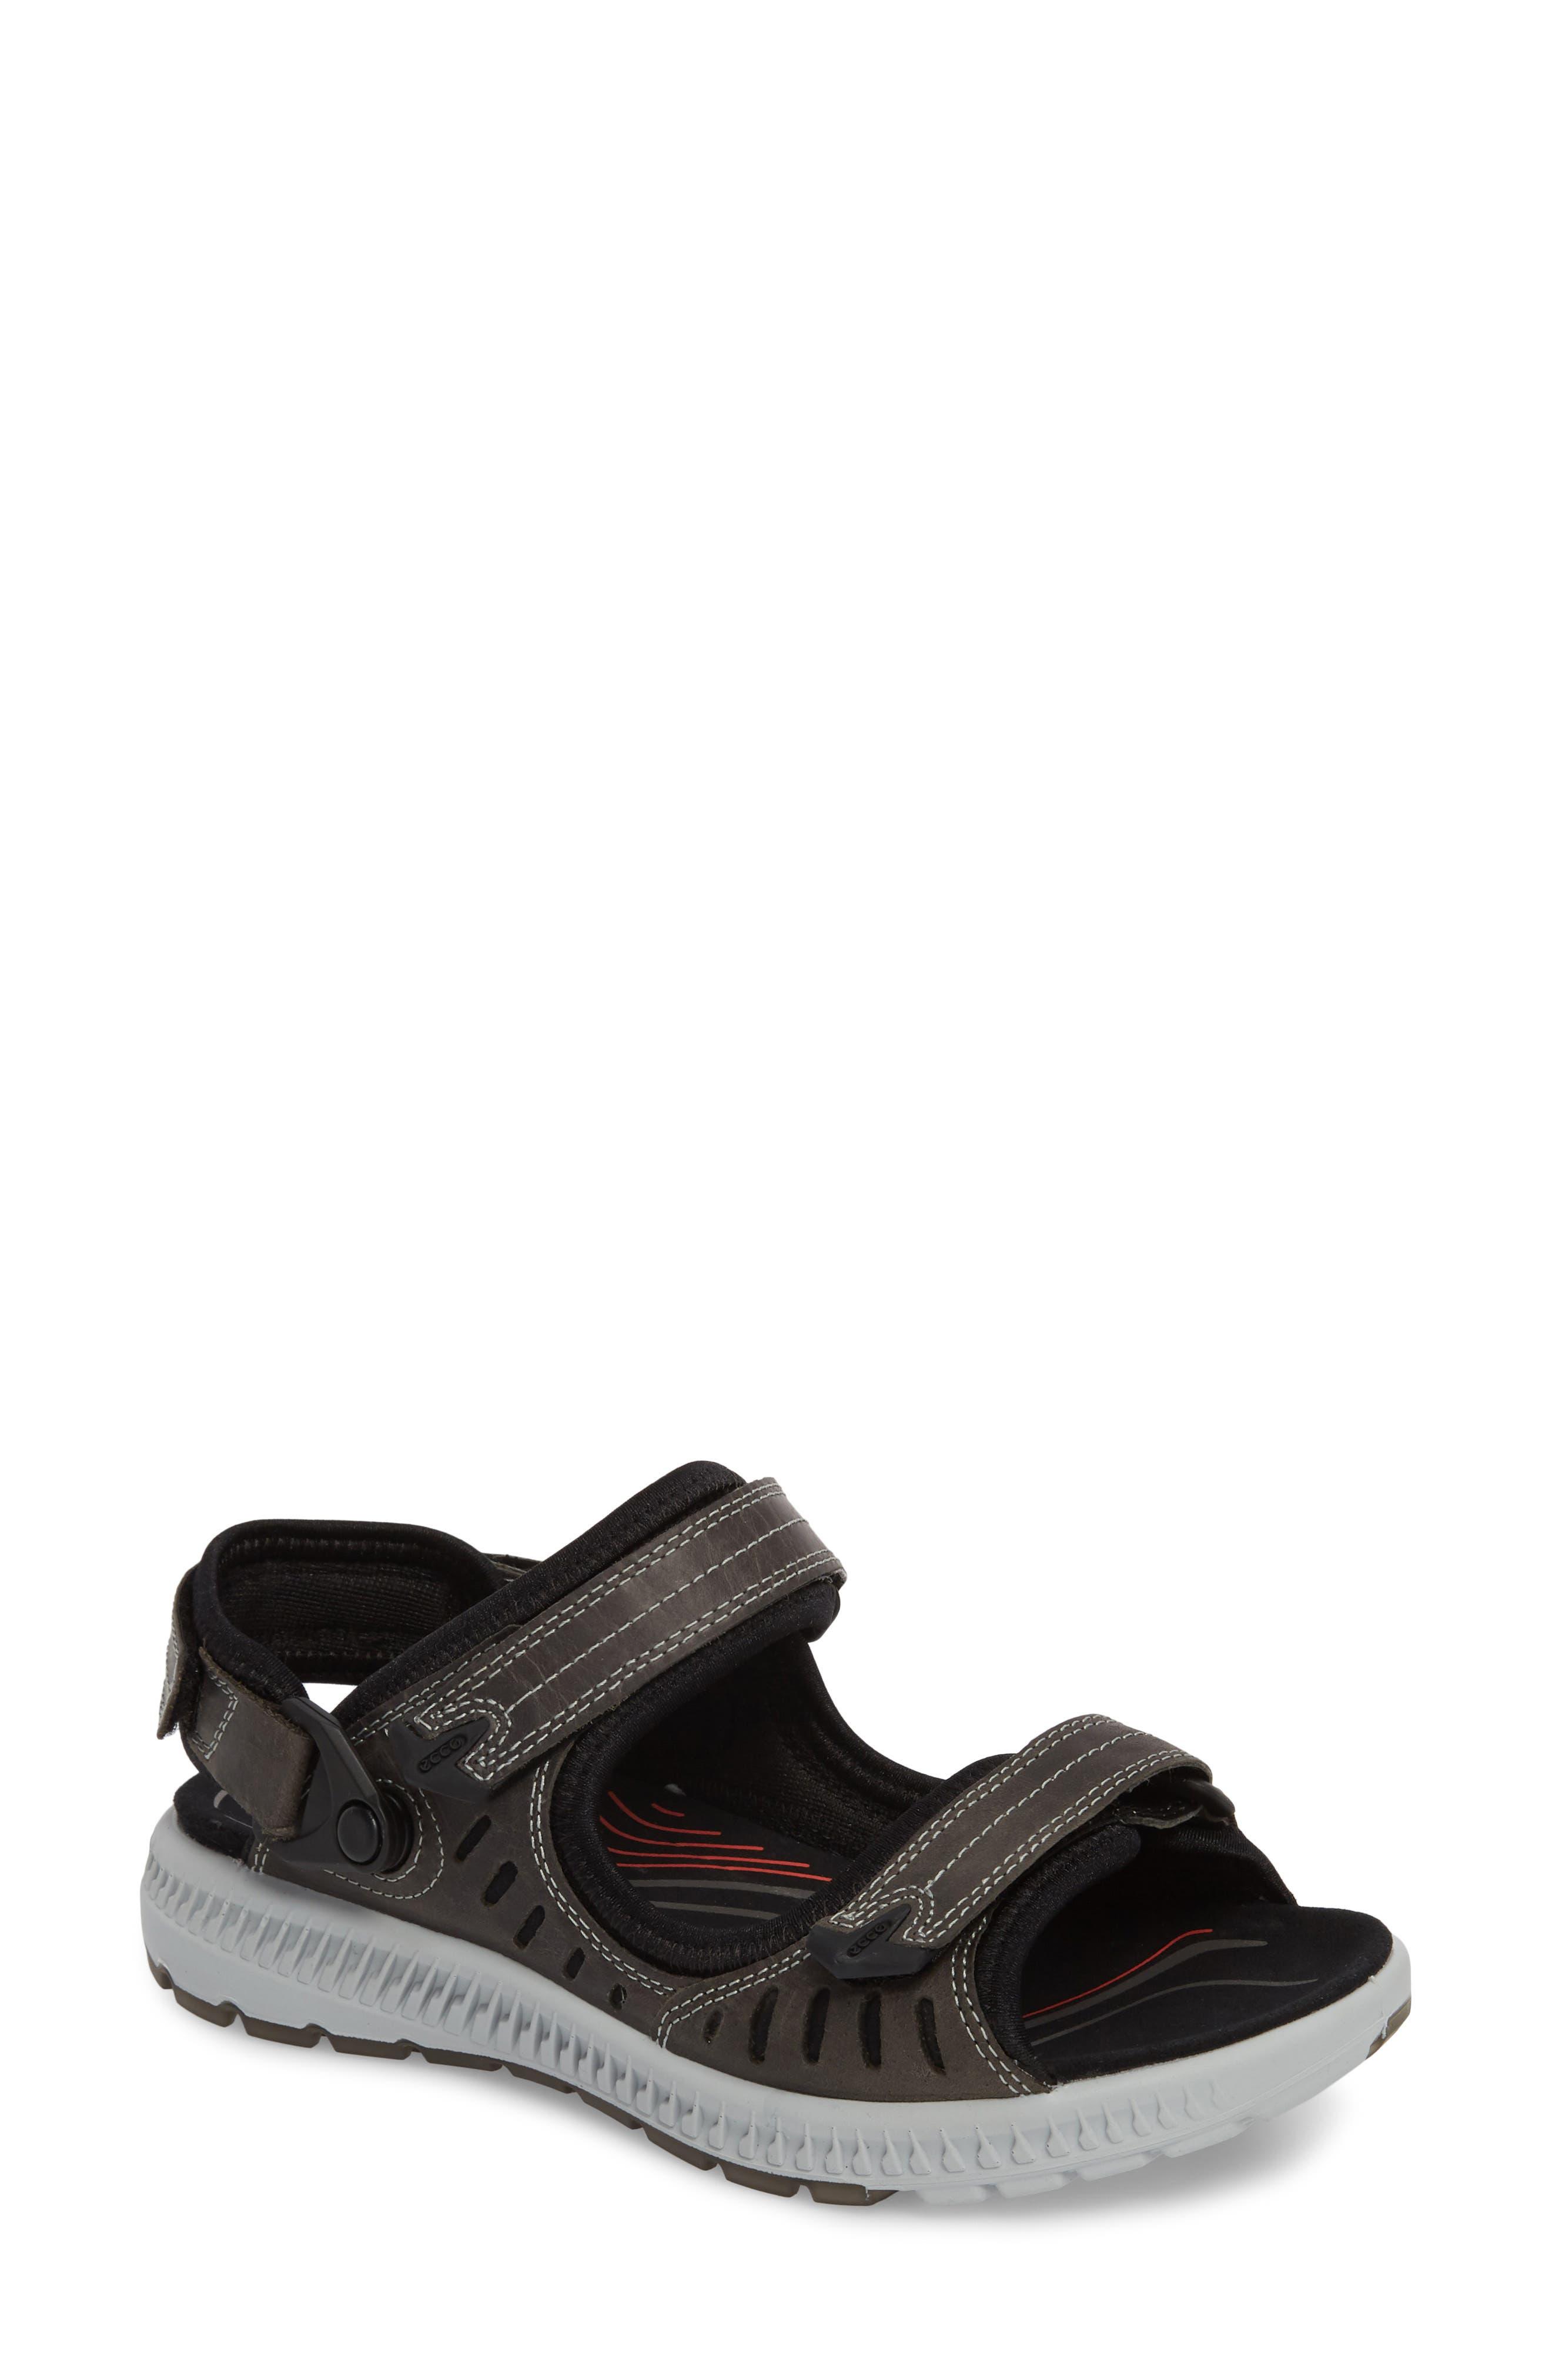 Terra 2S Sandal,                         Main,                         color, 069